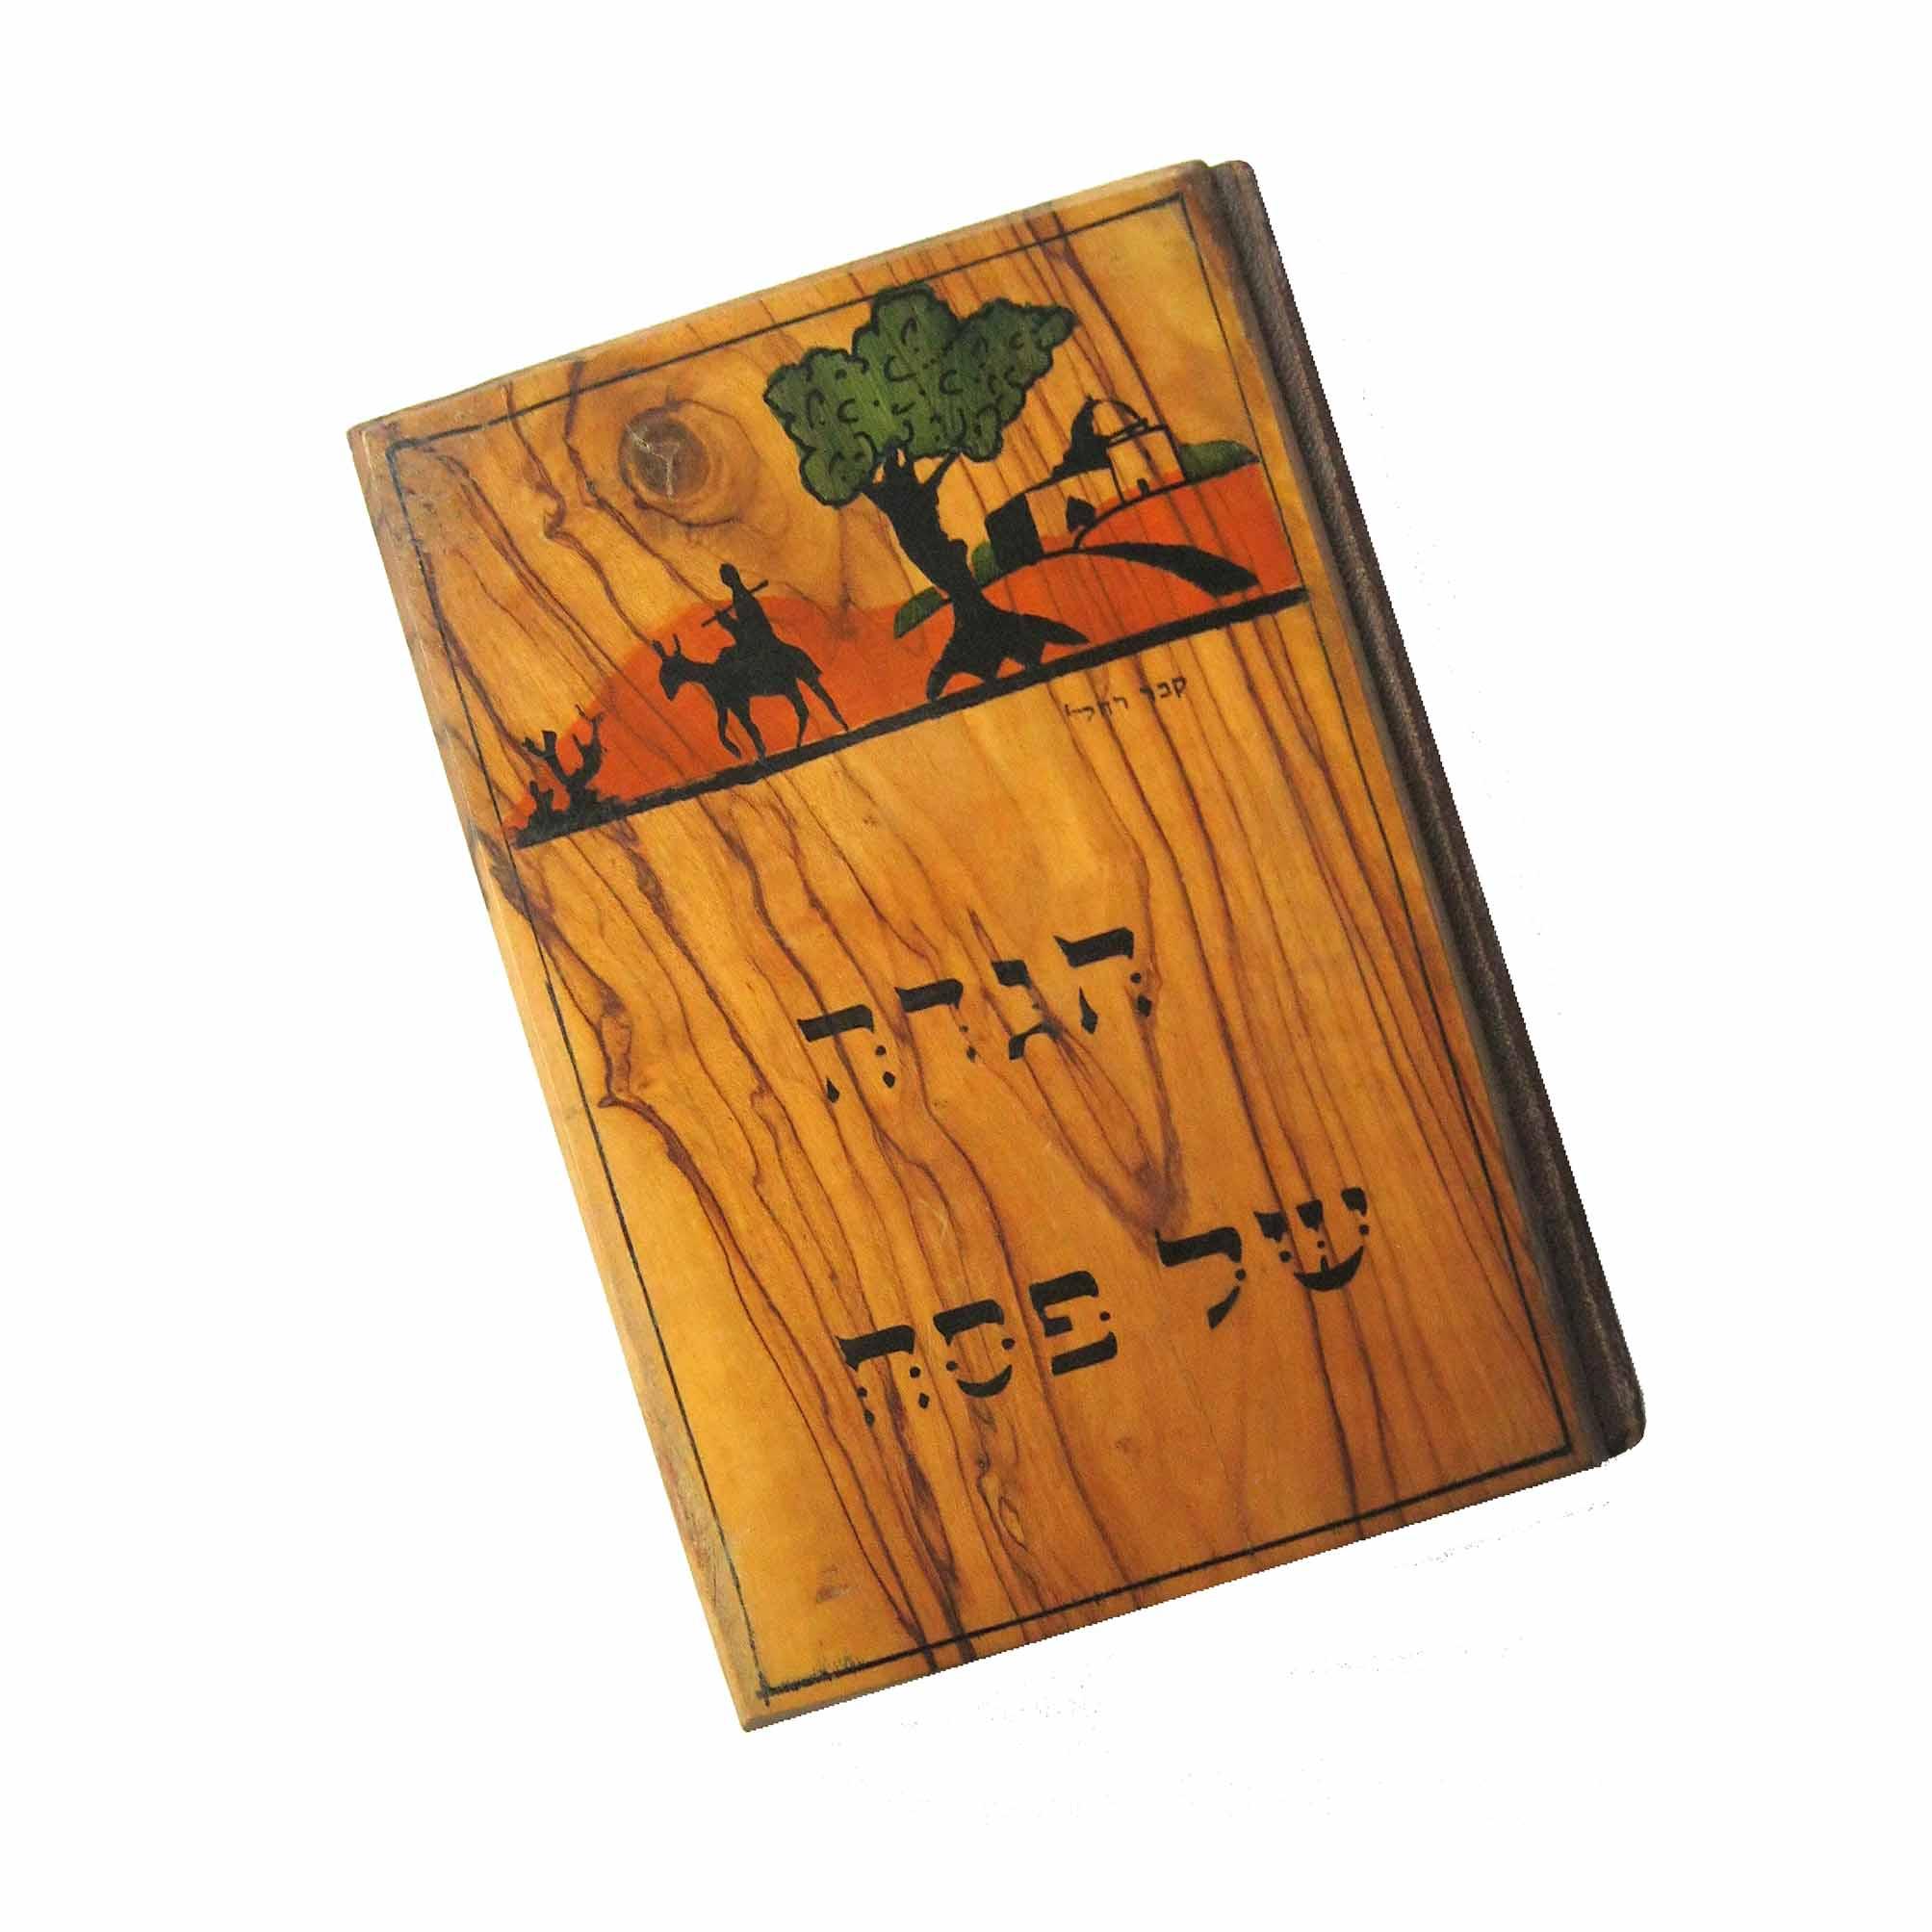 5616-Unna-Passover-Haggadah-Onamut-1937-Cover-free-N.jpg